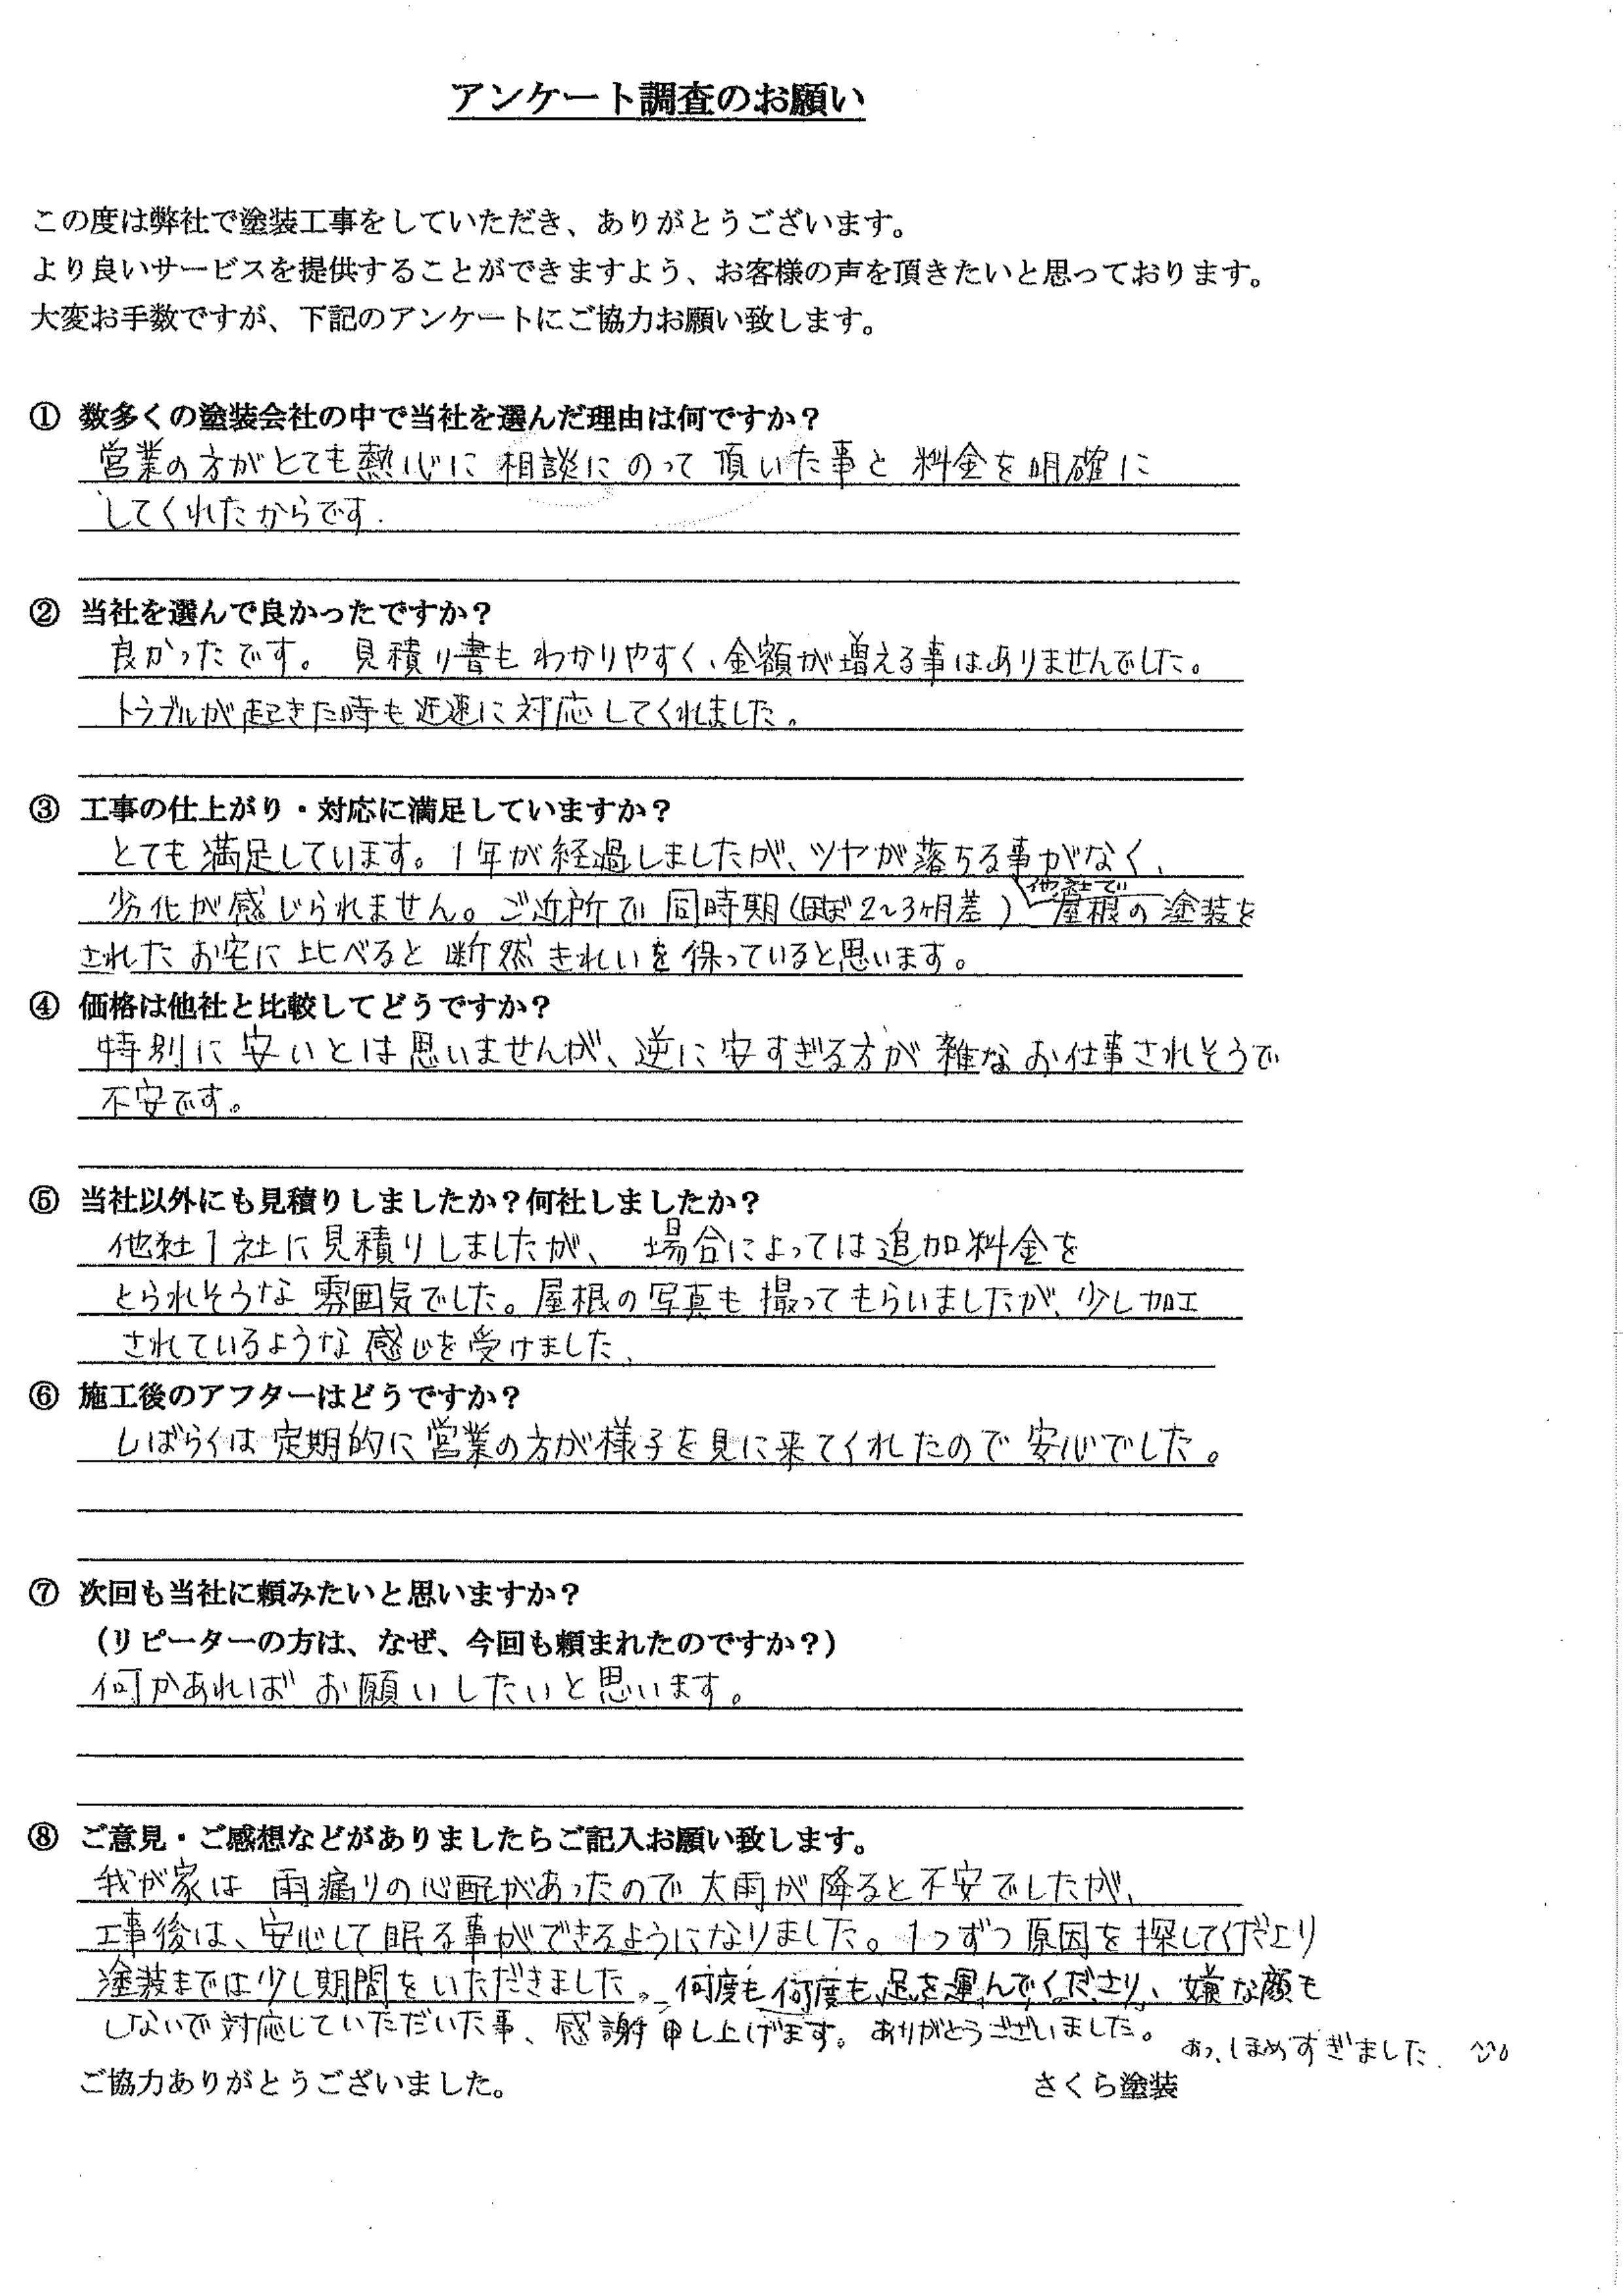 さくら塗装 埼玉県越谷市_M様_外壁屋根塗装工事_評価